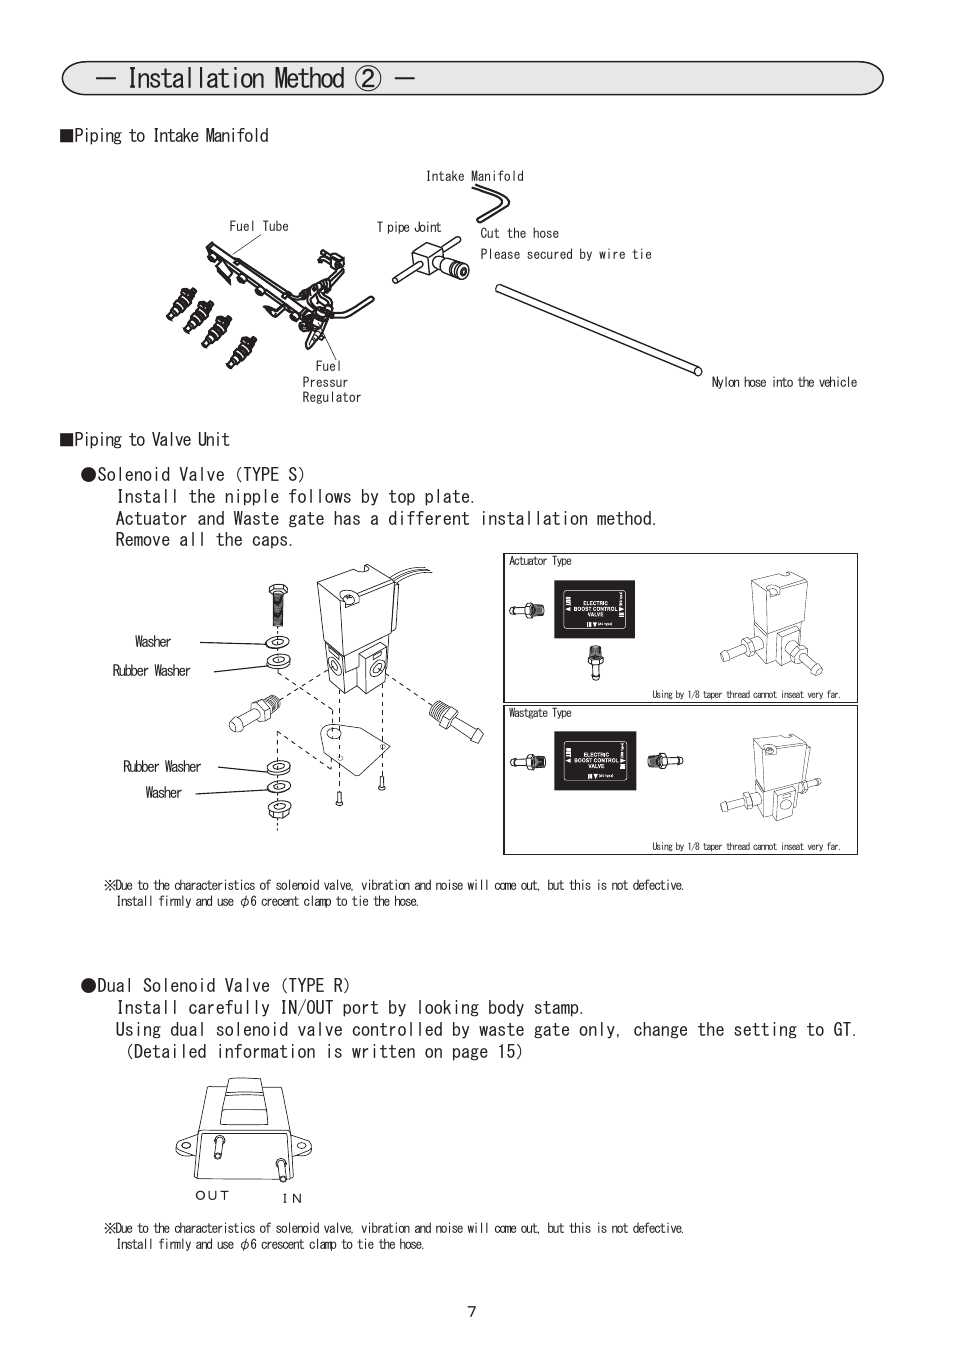 7 Installation Method Blitz Sbc Type S R 15 Solenoid Wiring Diagram User Manual Page 8 18